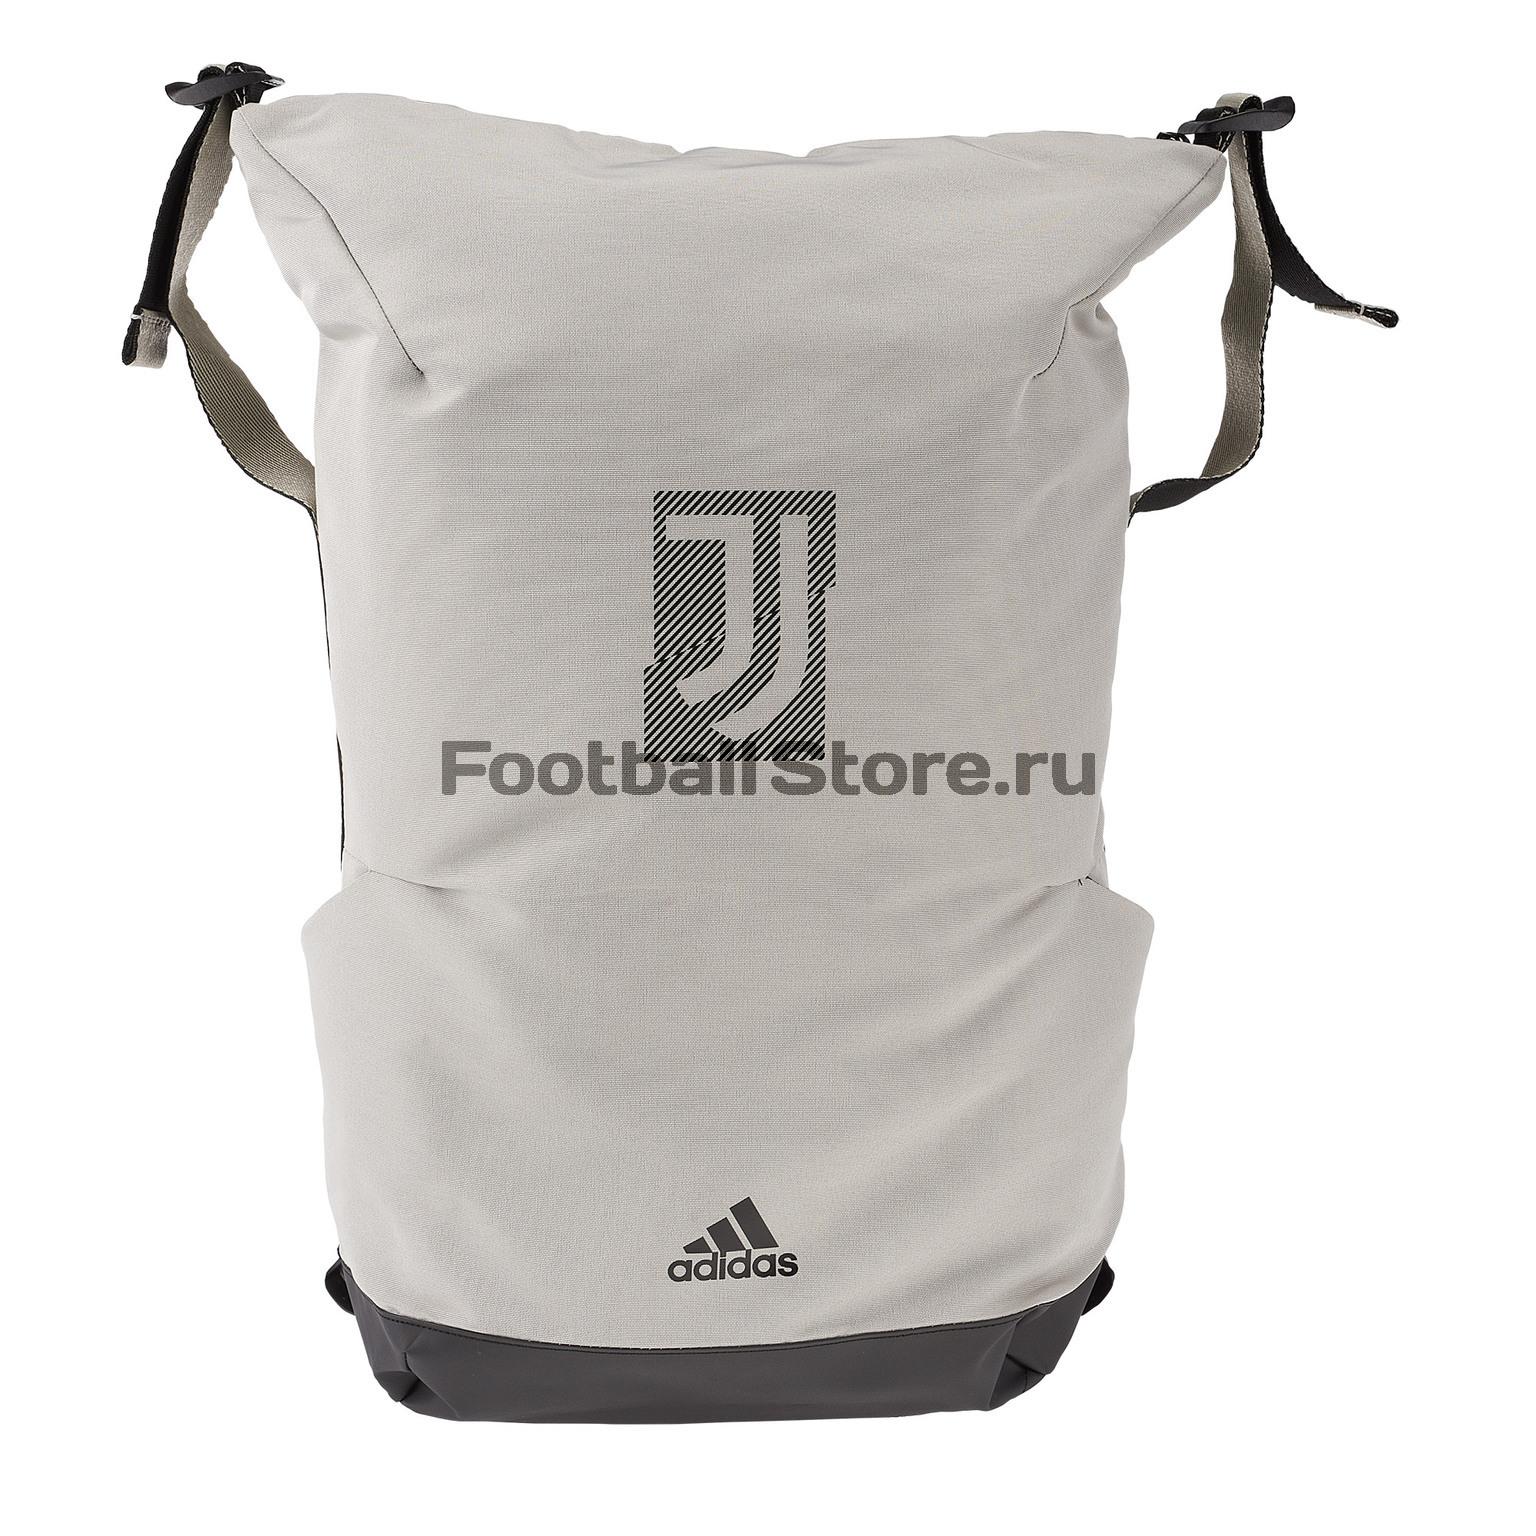 Рюкзак Adidas Juventus CY5571